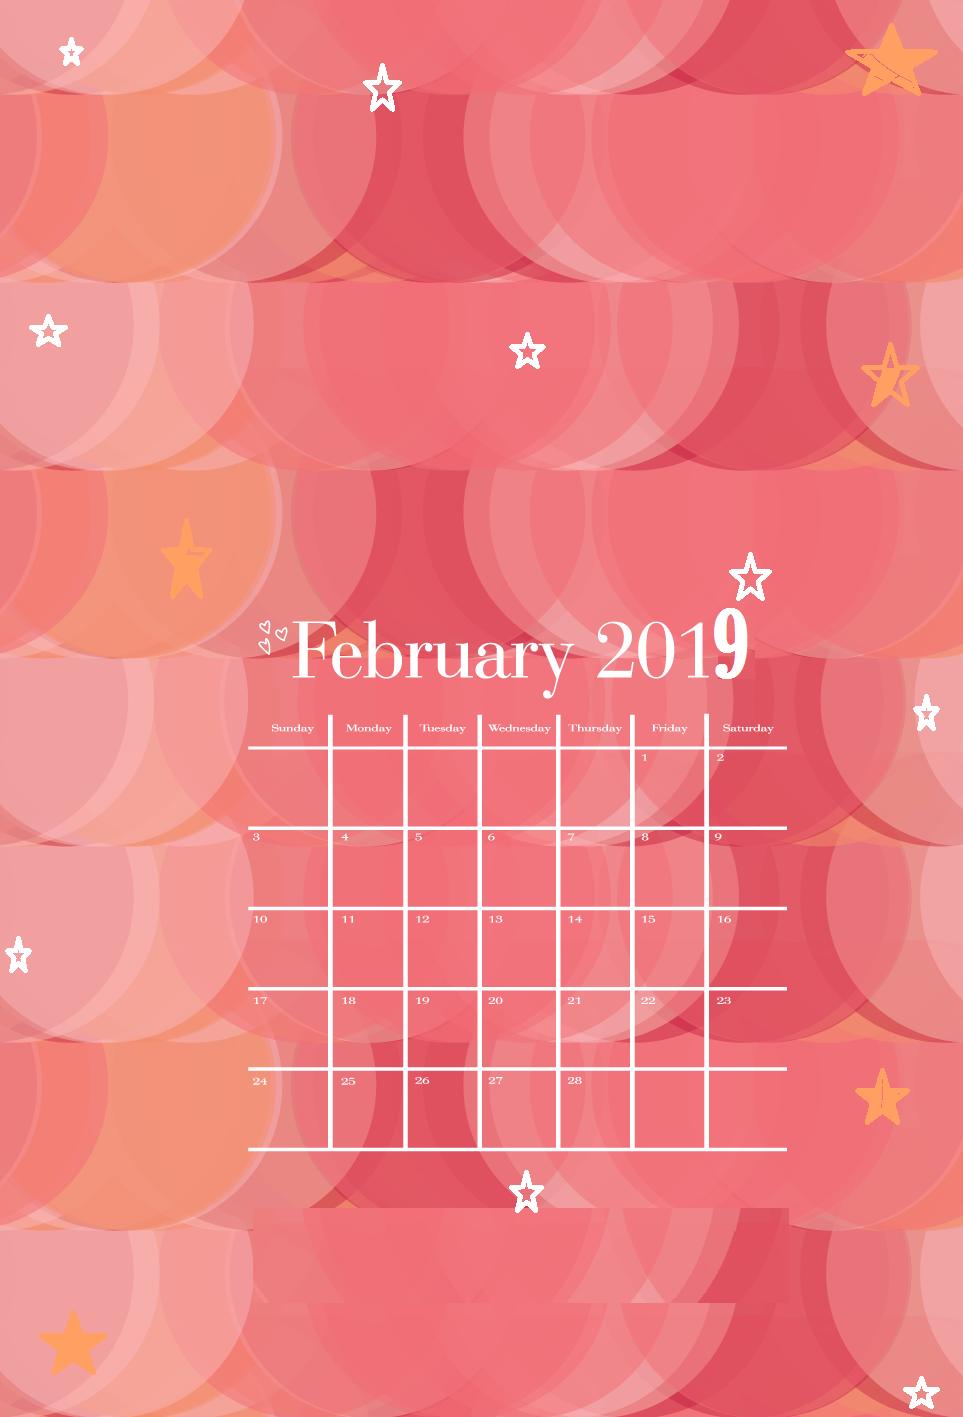 February 2019 Calendar Holiday Theme February 2019 iPhone Calendar Wallpapers | Monthly Calendar